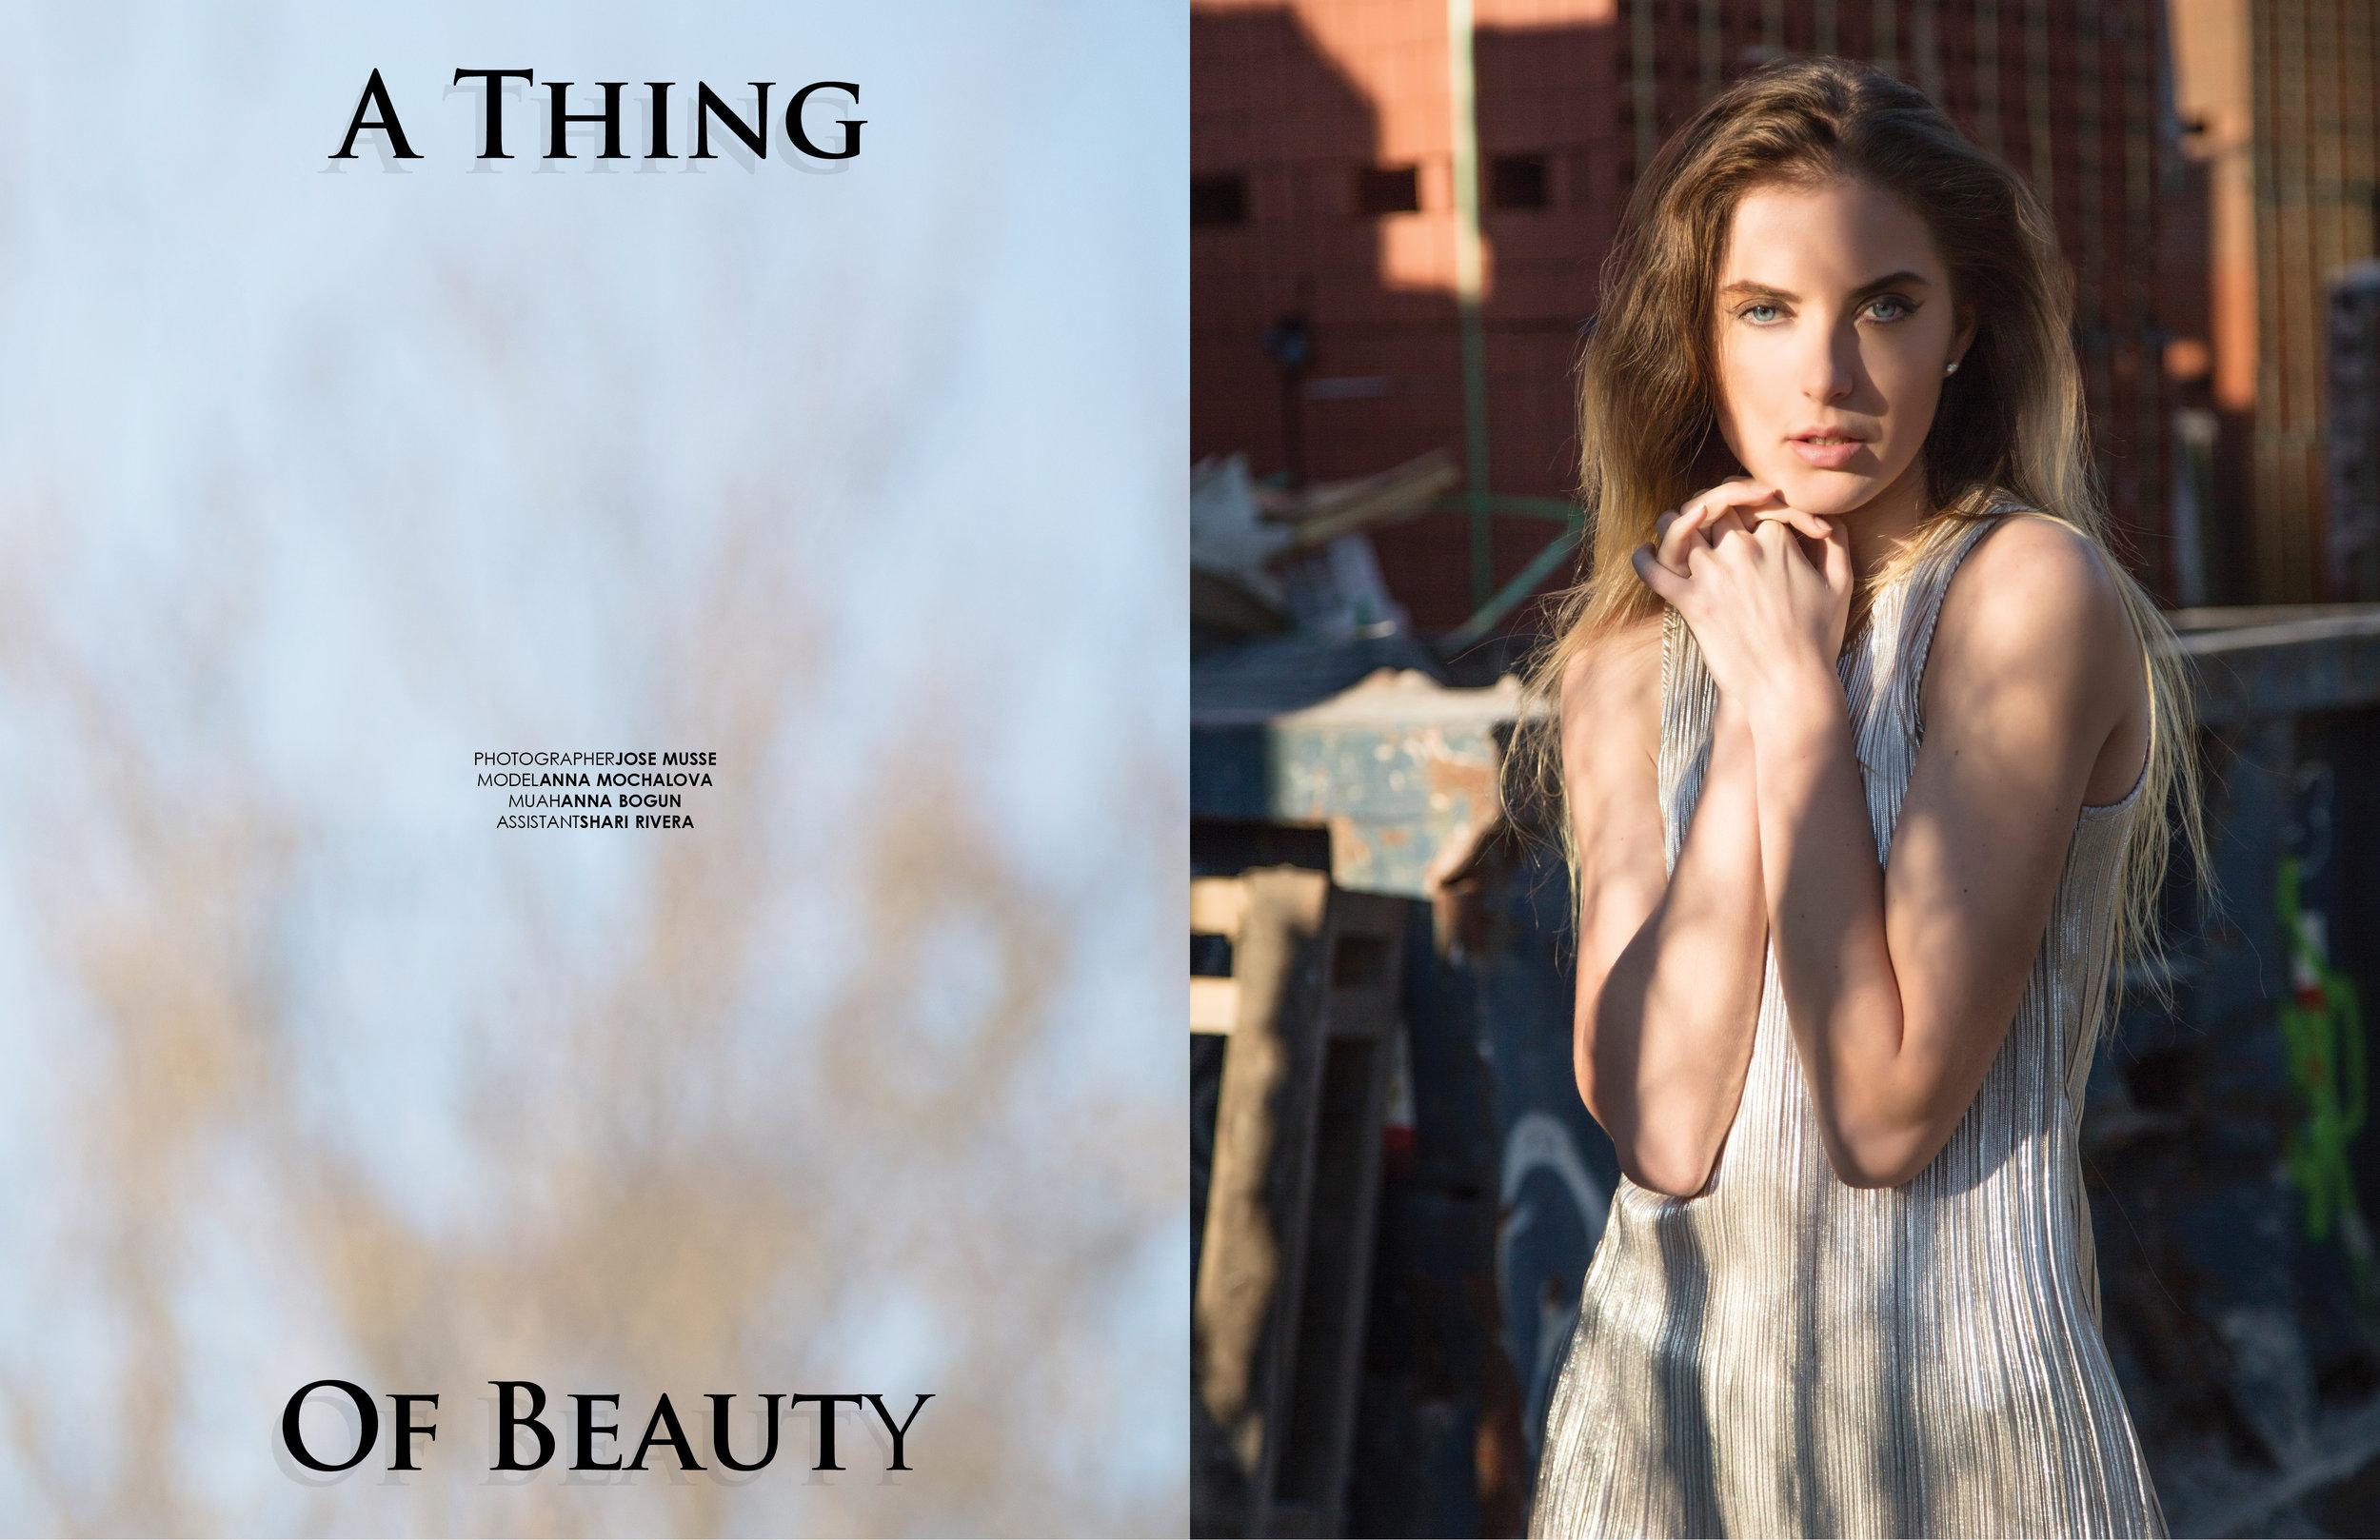 THING-BEAUTY-JOSE_MUSSE2.jpg